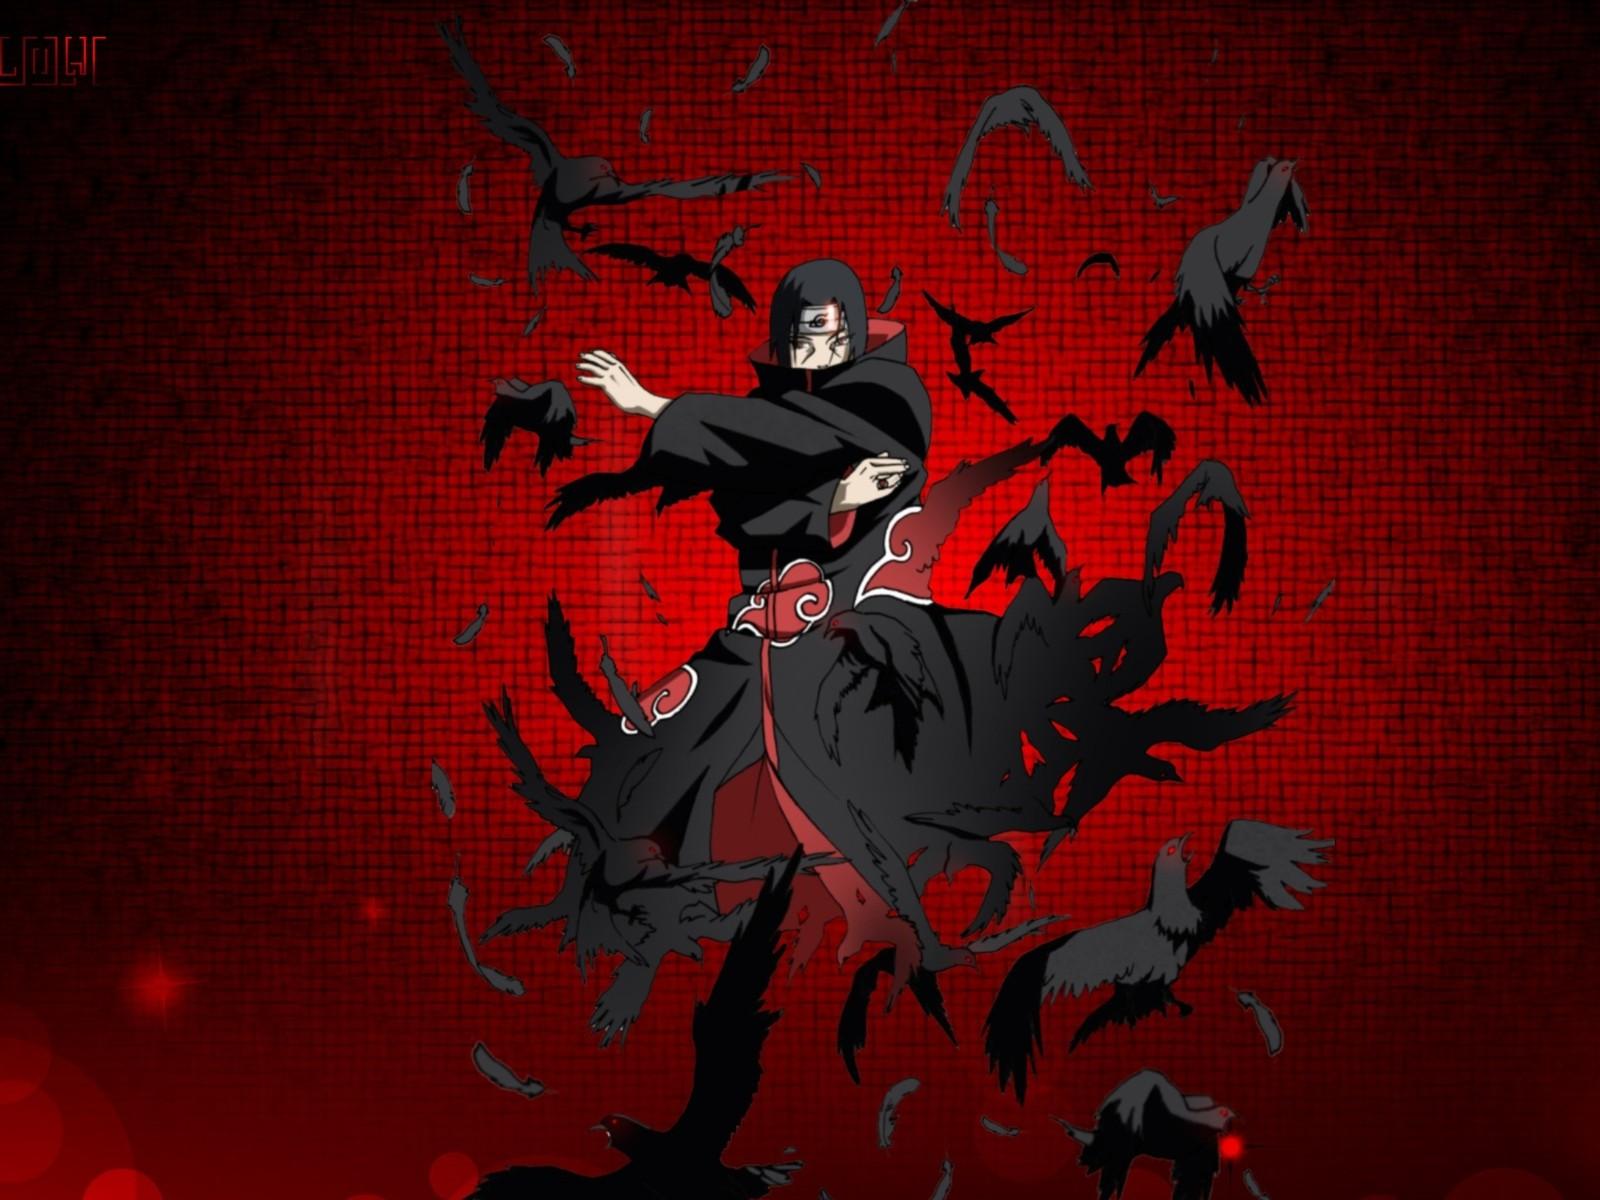 Beautiful Wallpaper Naruto Red - Naruto_Shippuuden_Uchiha_Itachi_raven_red_background_Akatsuki_anime_boys-197552  Gallery_1183.jpg!d